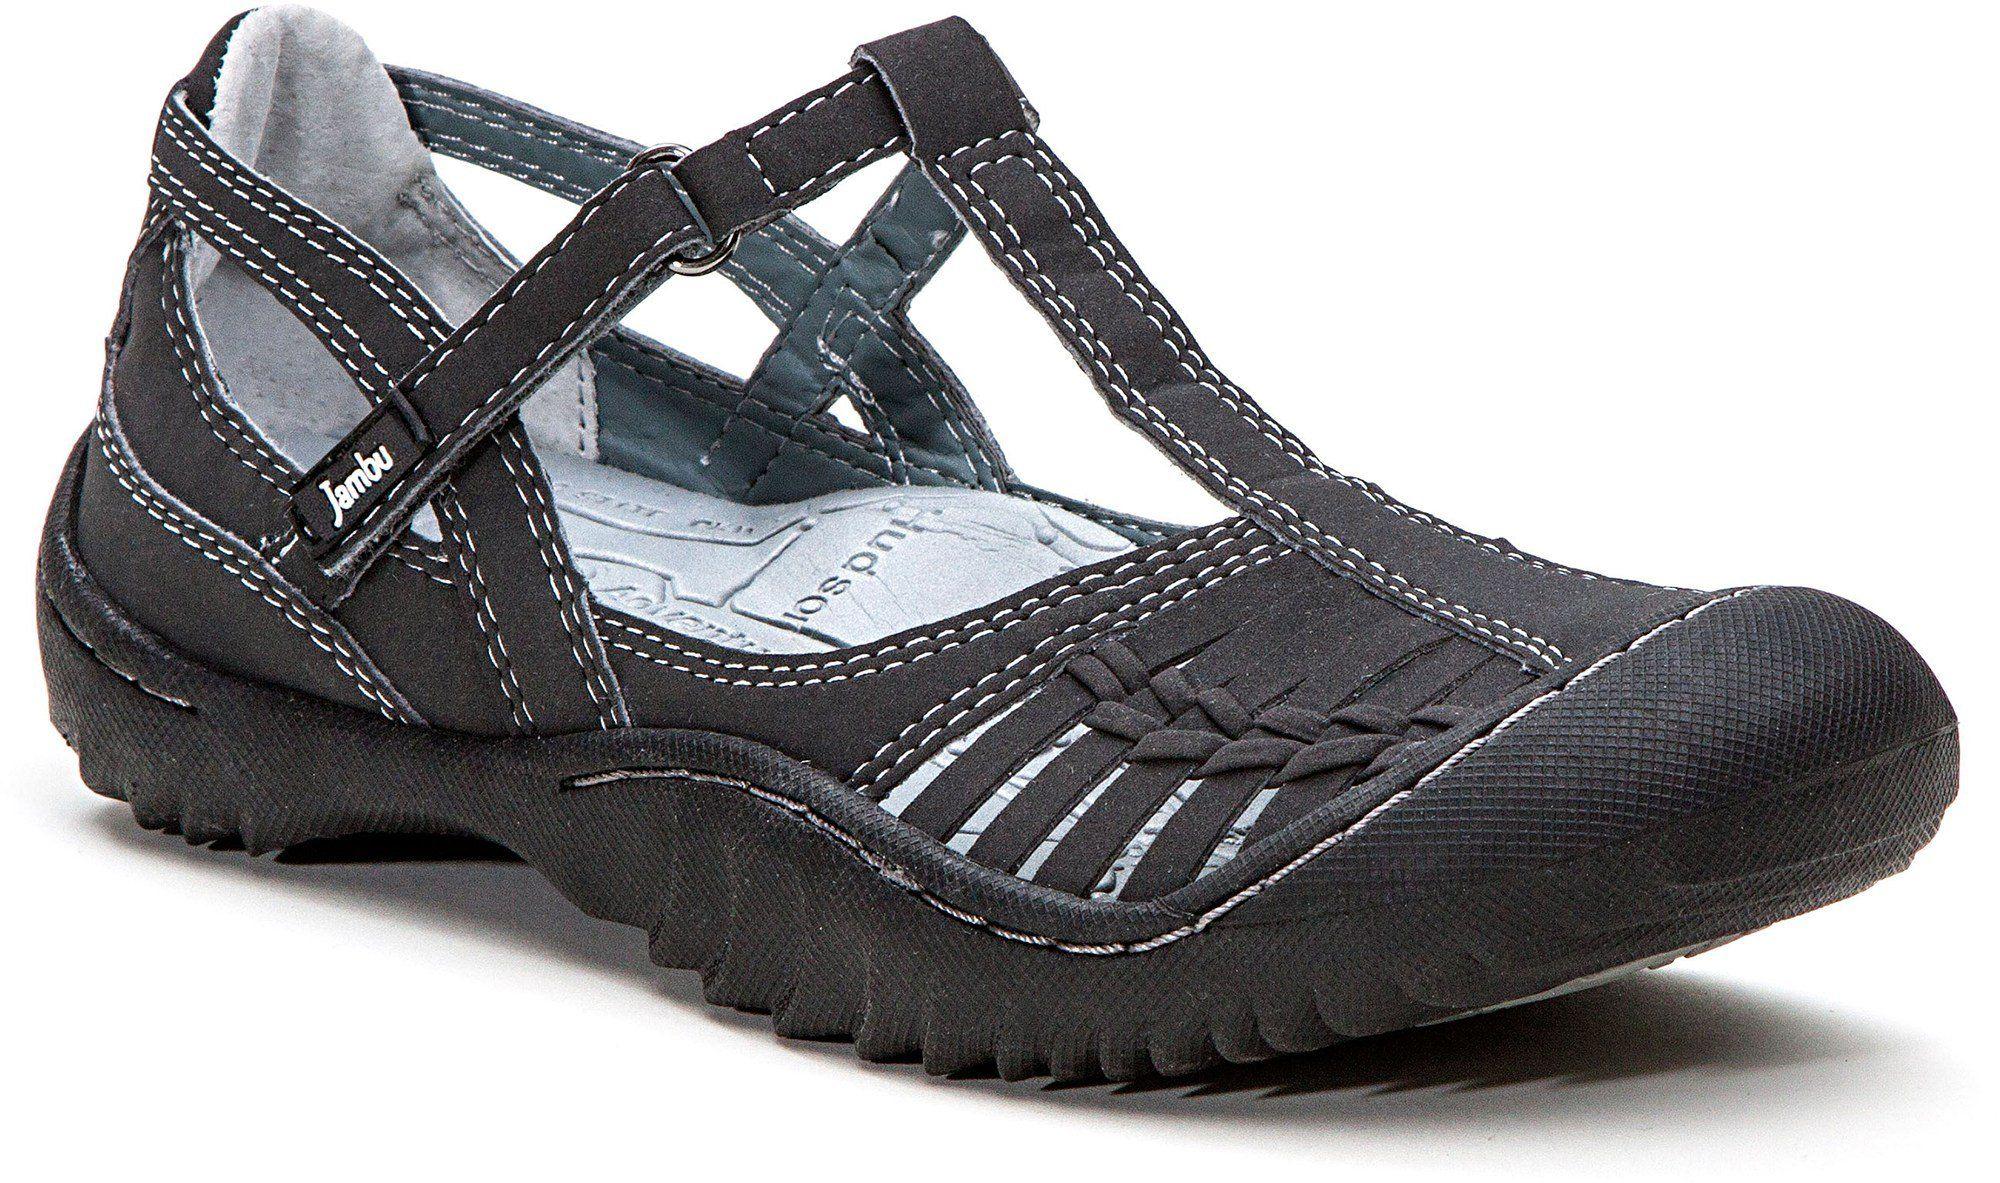 3947f6cf85f39 Amazon.com: New Jambu Cliff Charcoal T-strap Shoes Ladies 6: Shoes ...